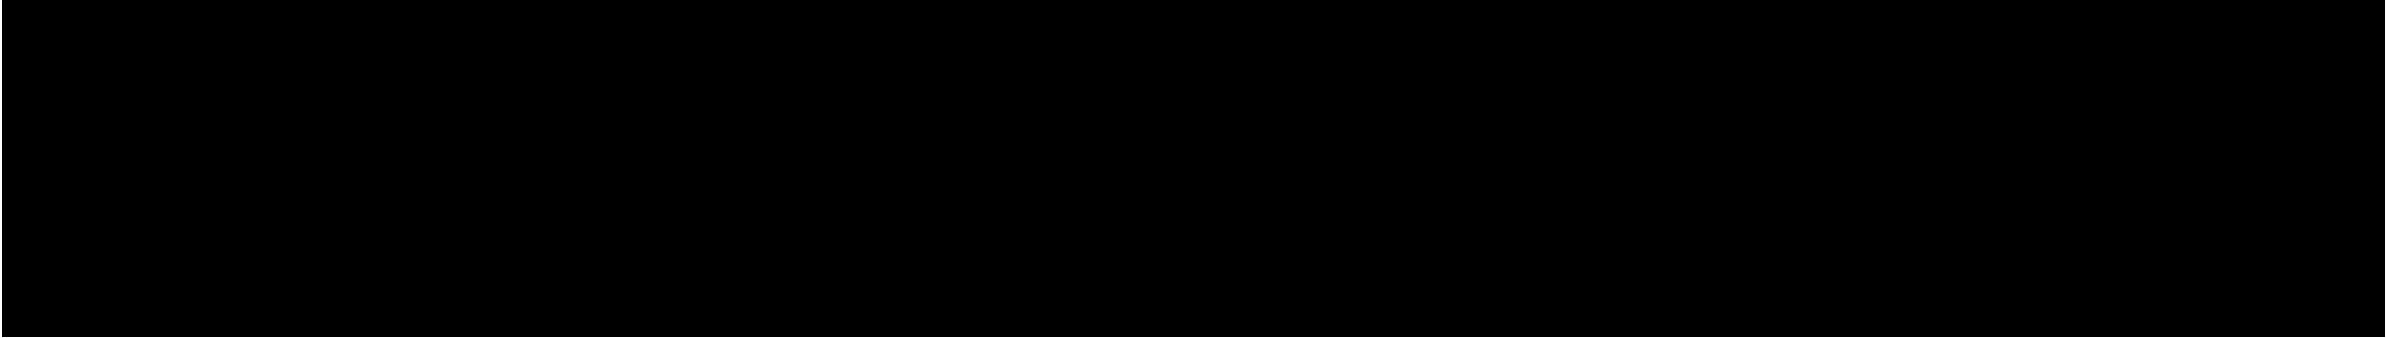 z-style_velikostni-tabulky_cz_2386x338px_myron-bibpants_p71002